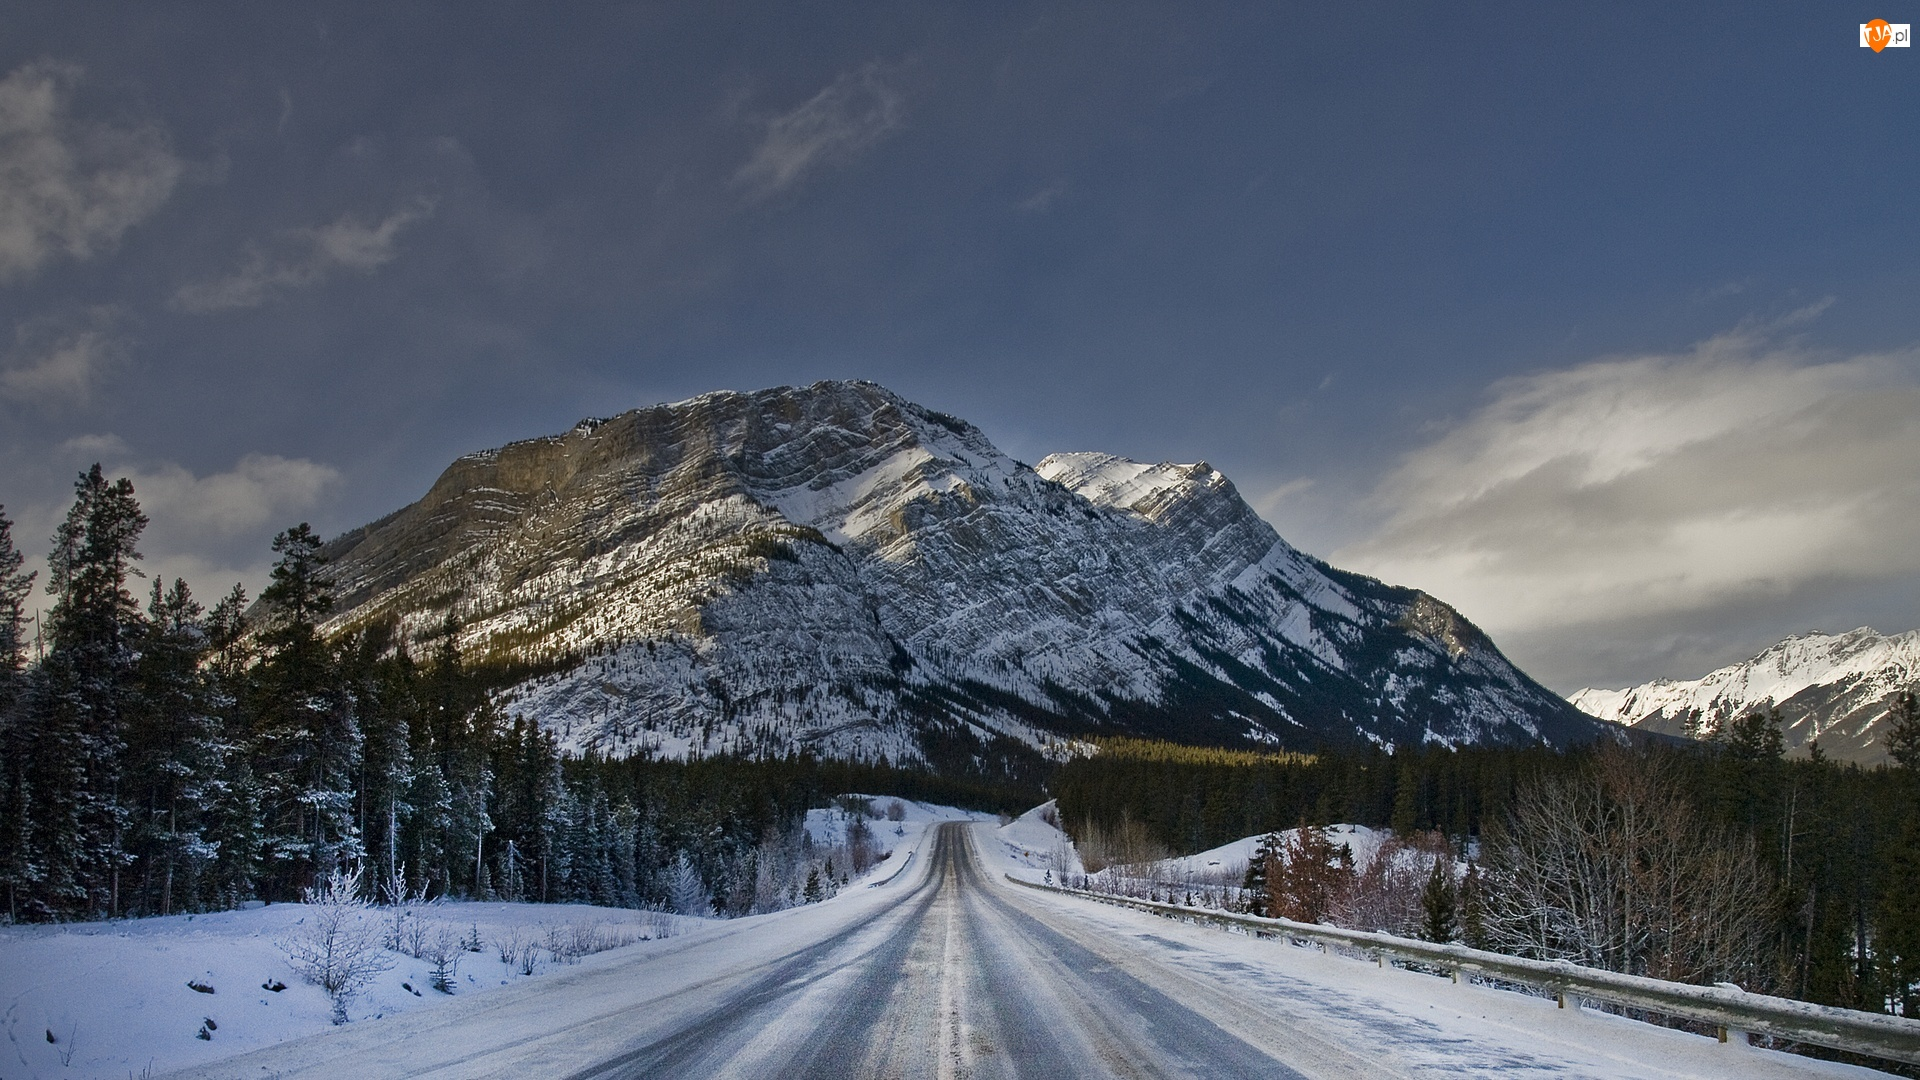 Góra, Śnieg, Droga, Drzewa